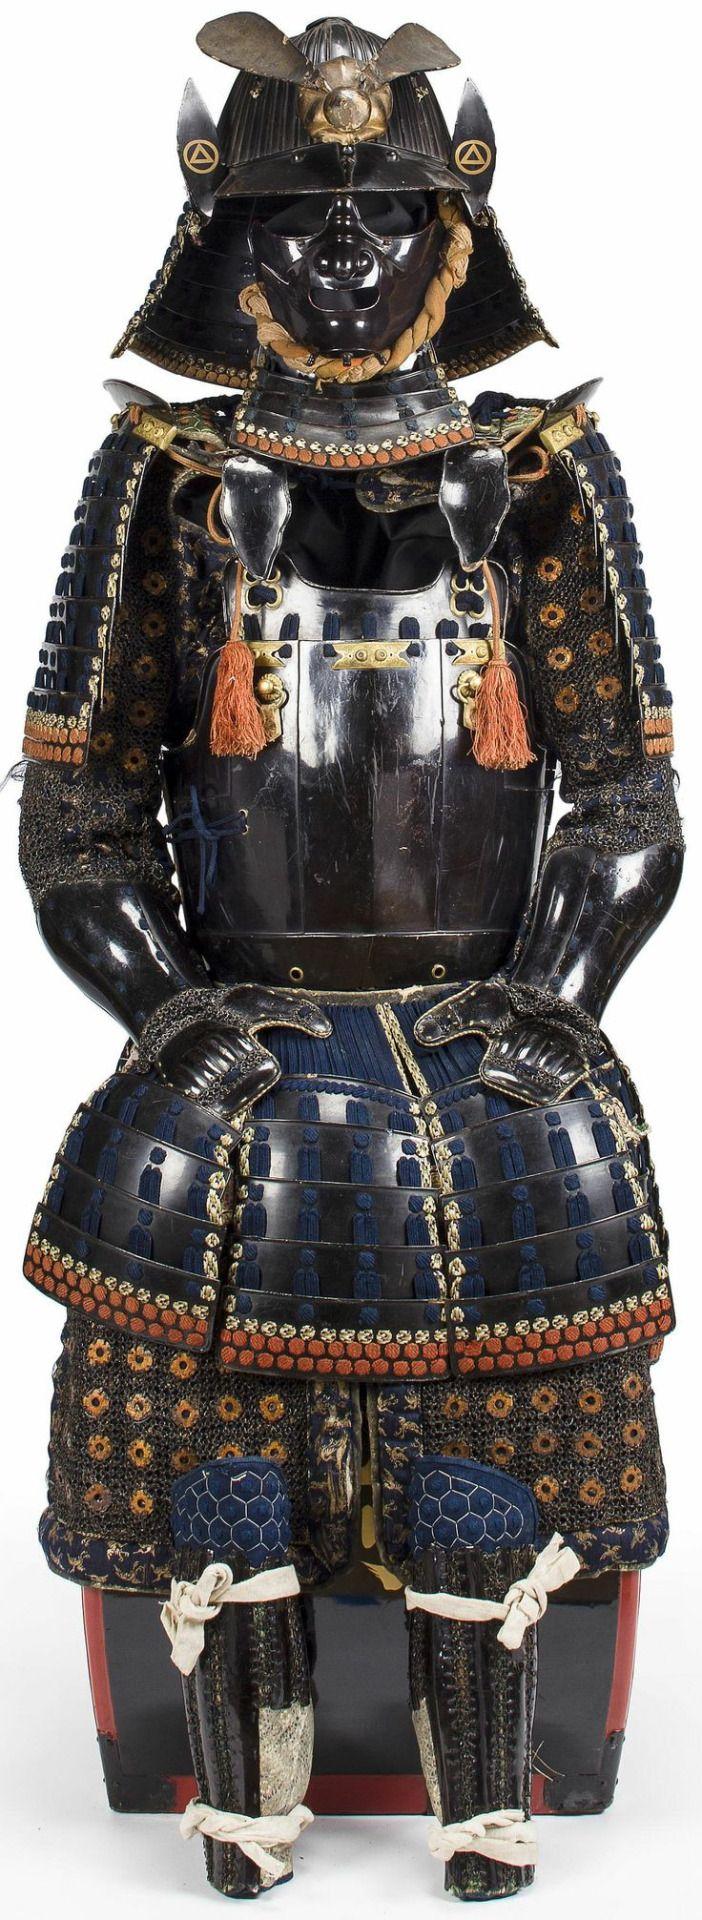 samurai armor                                                                                                                                                                                 More